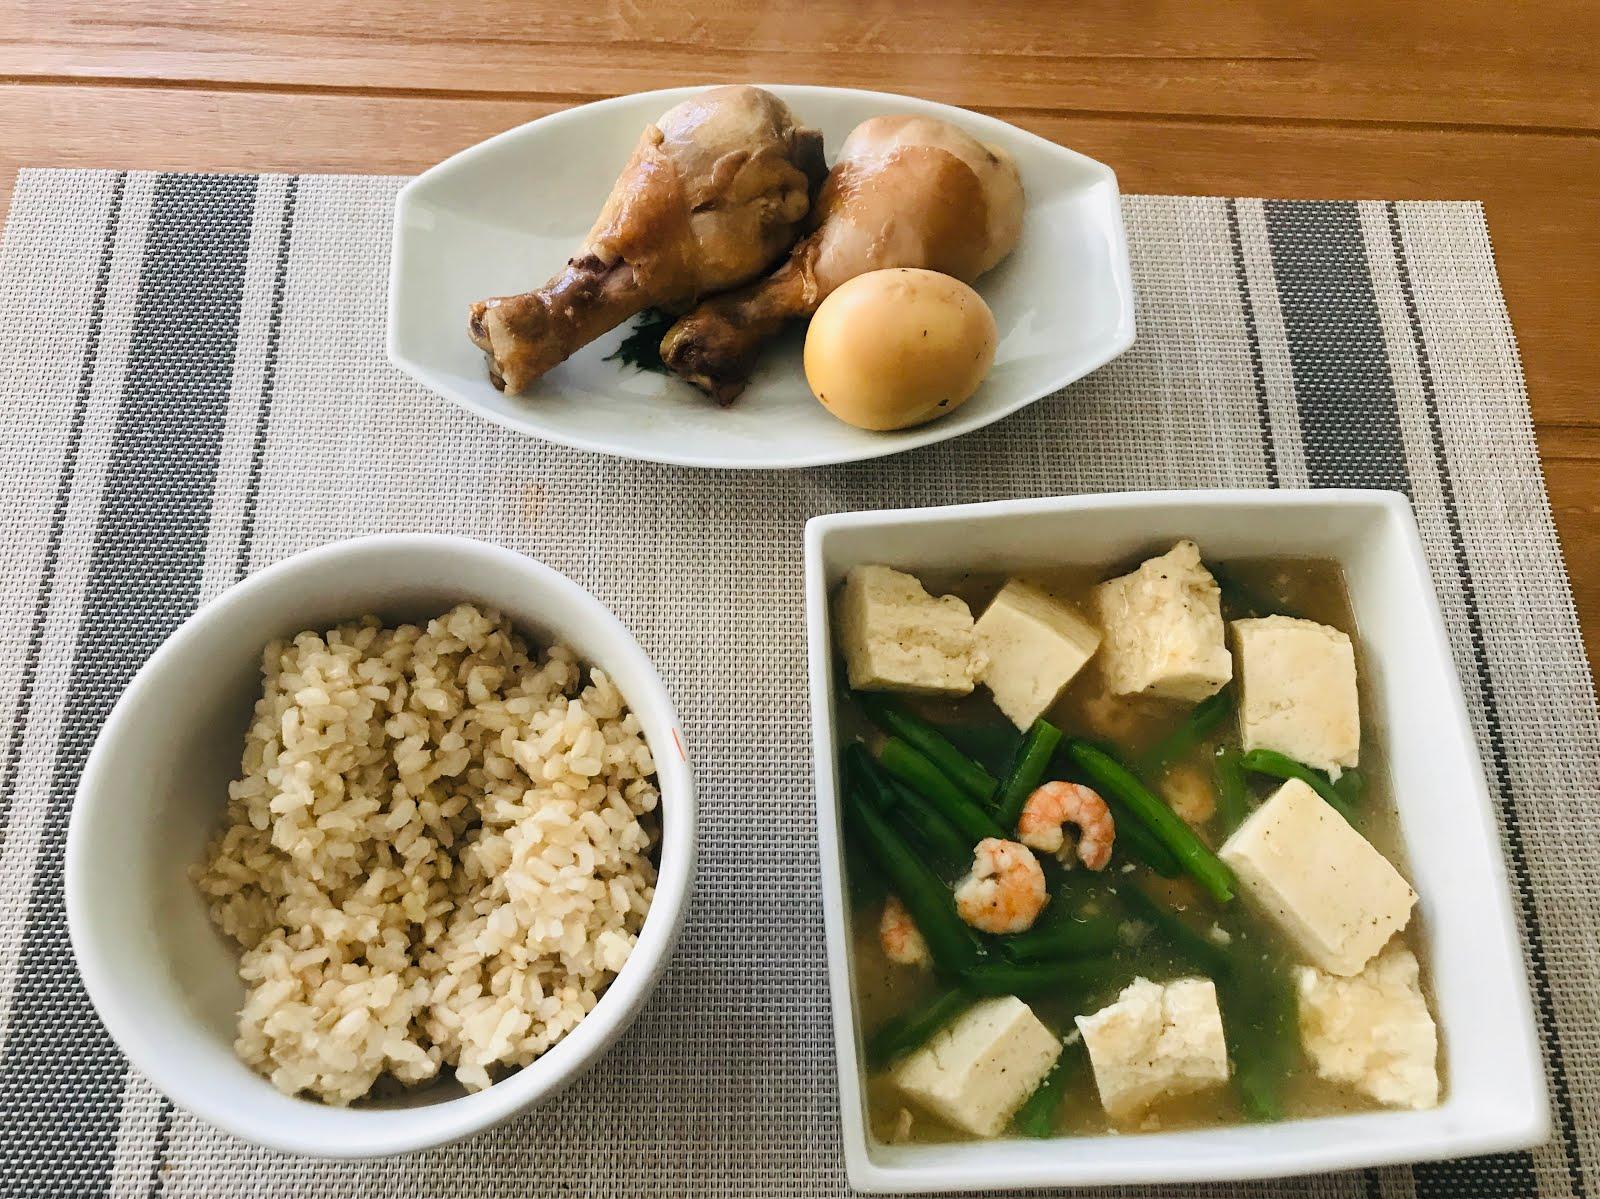 faras food mainly vegetarian